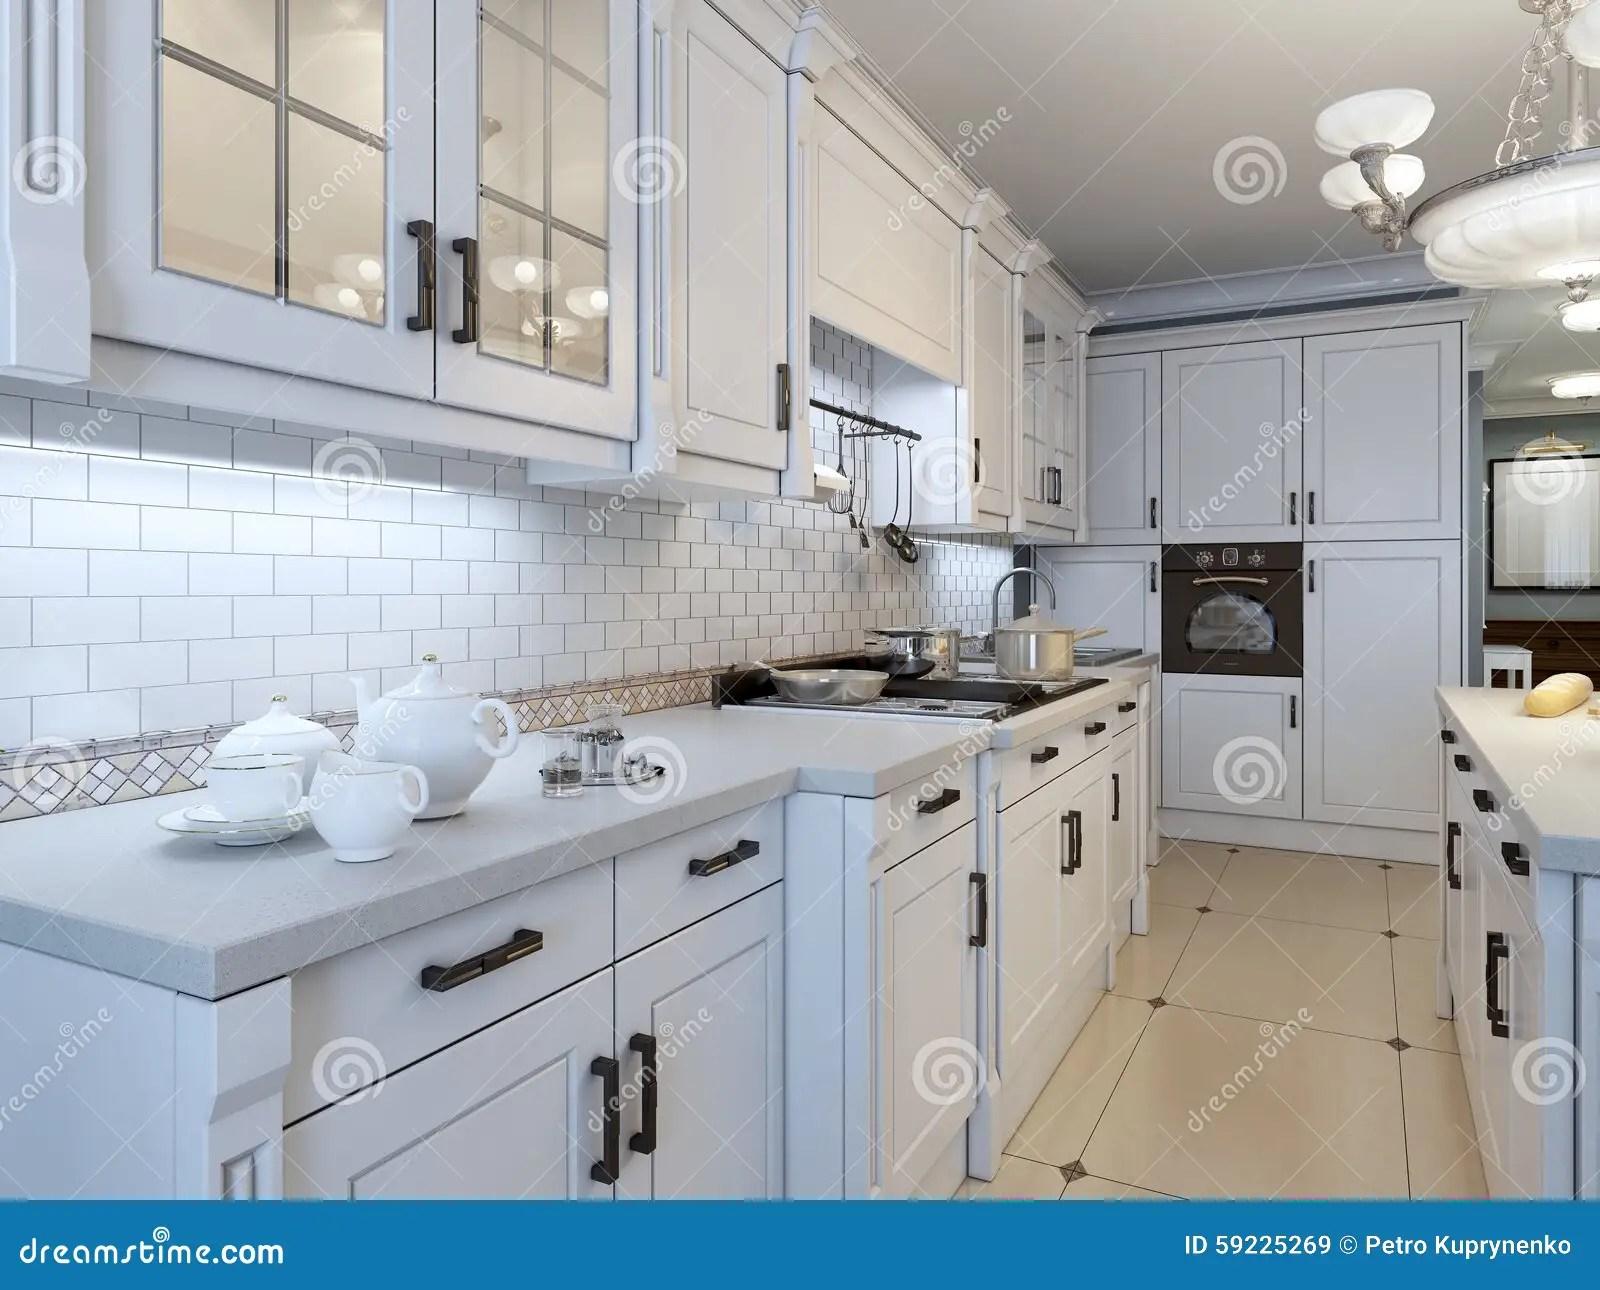 kitchen art decor stainless steel trash can 厨房艺术装饰趋向库存图片 图片包括有颜色 机柜 艺术 内部 蓝色 厨房艺术装饰趋向